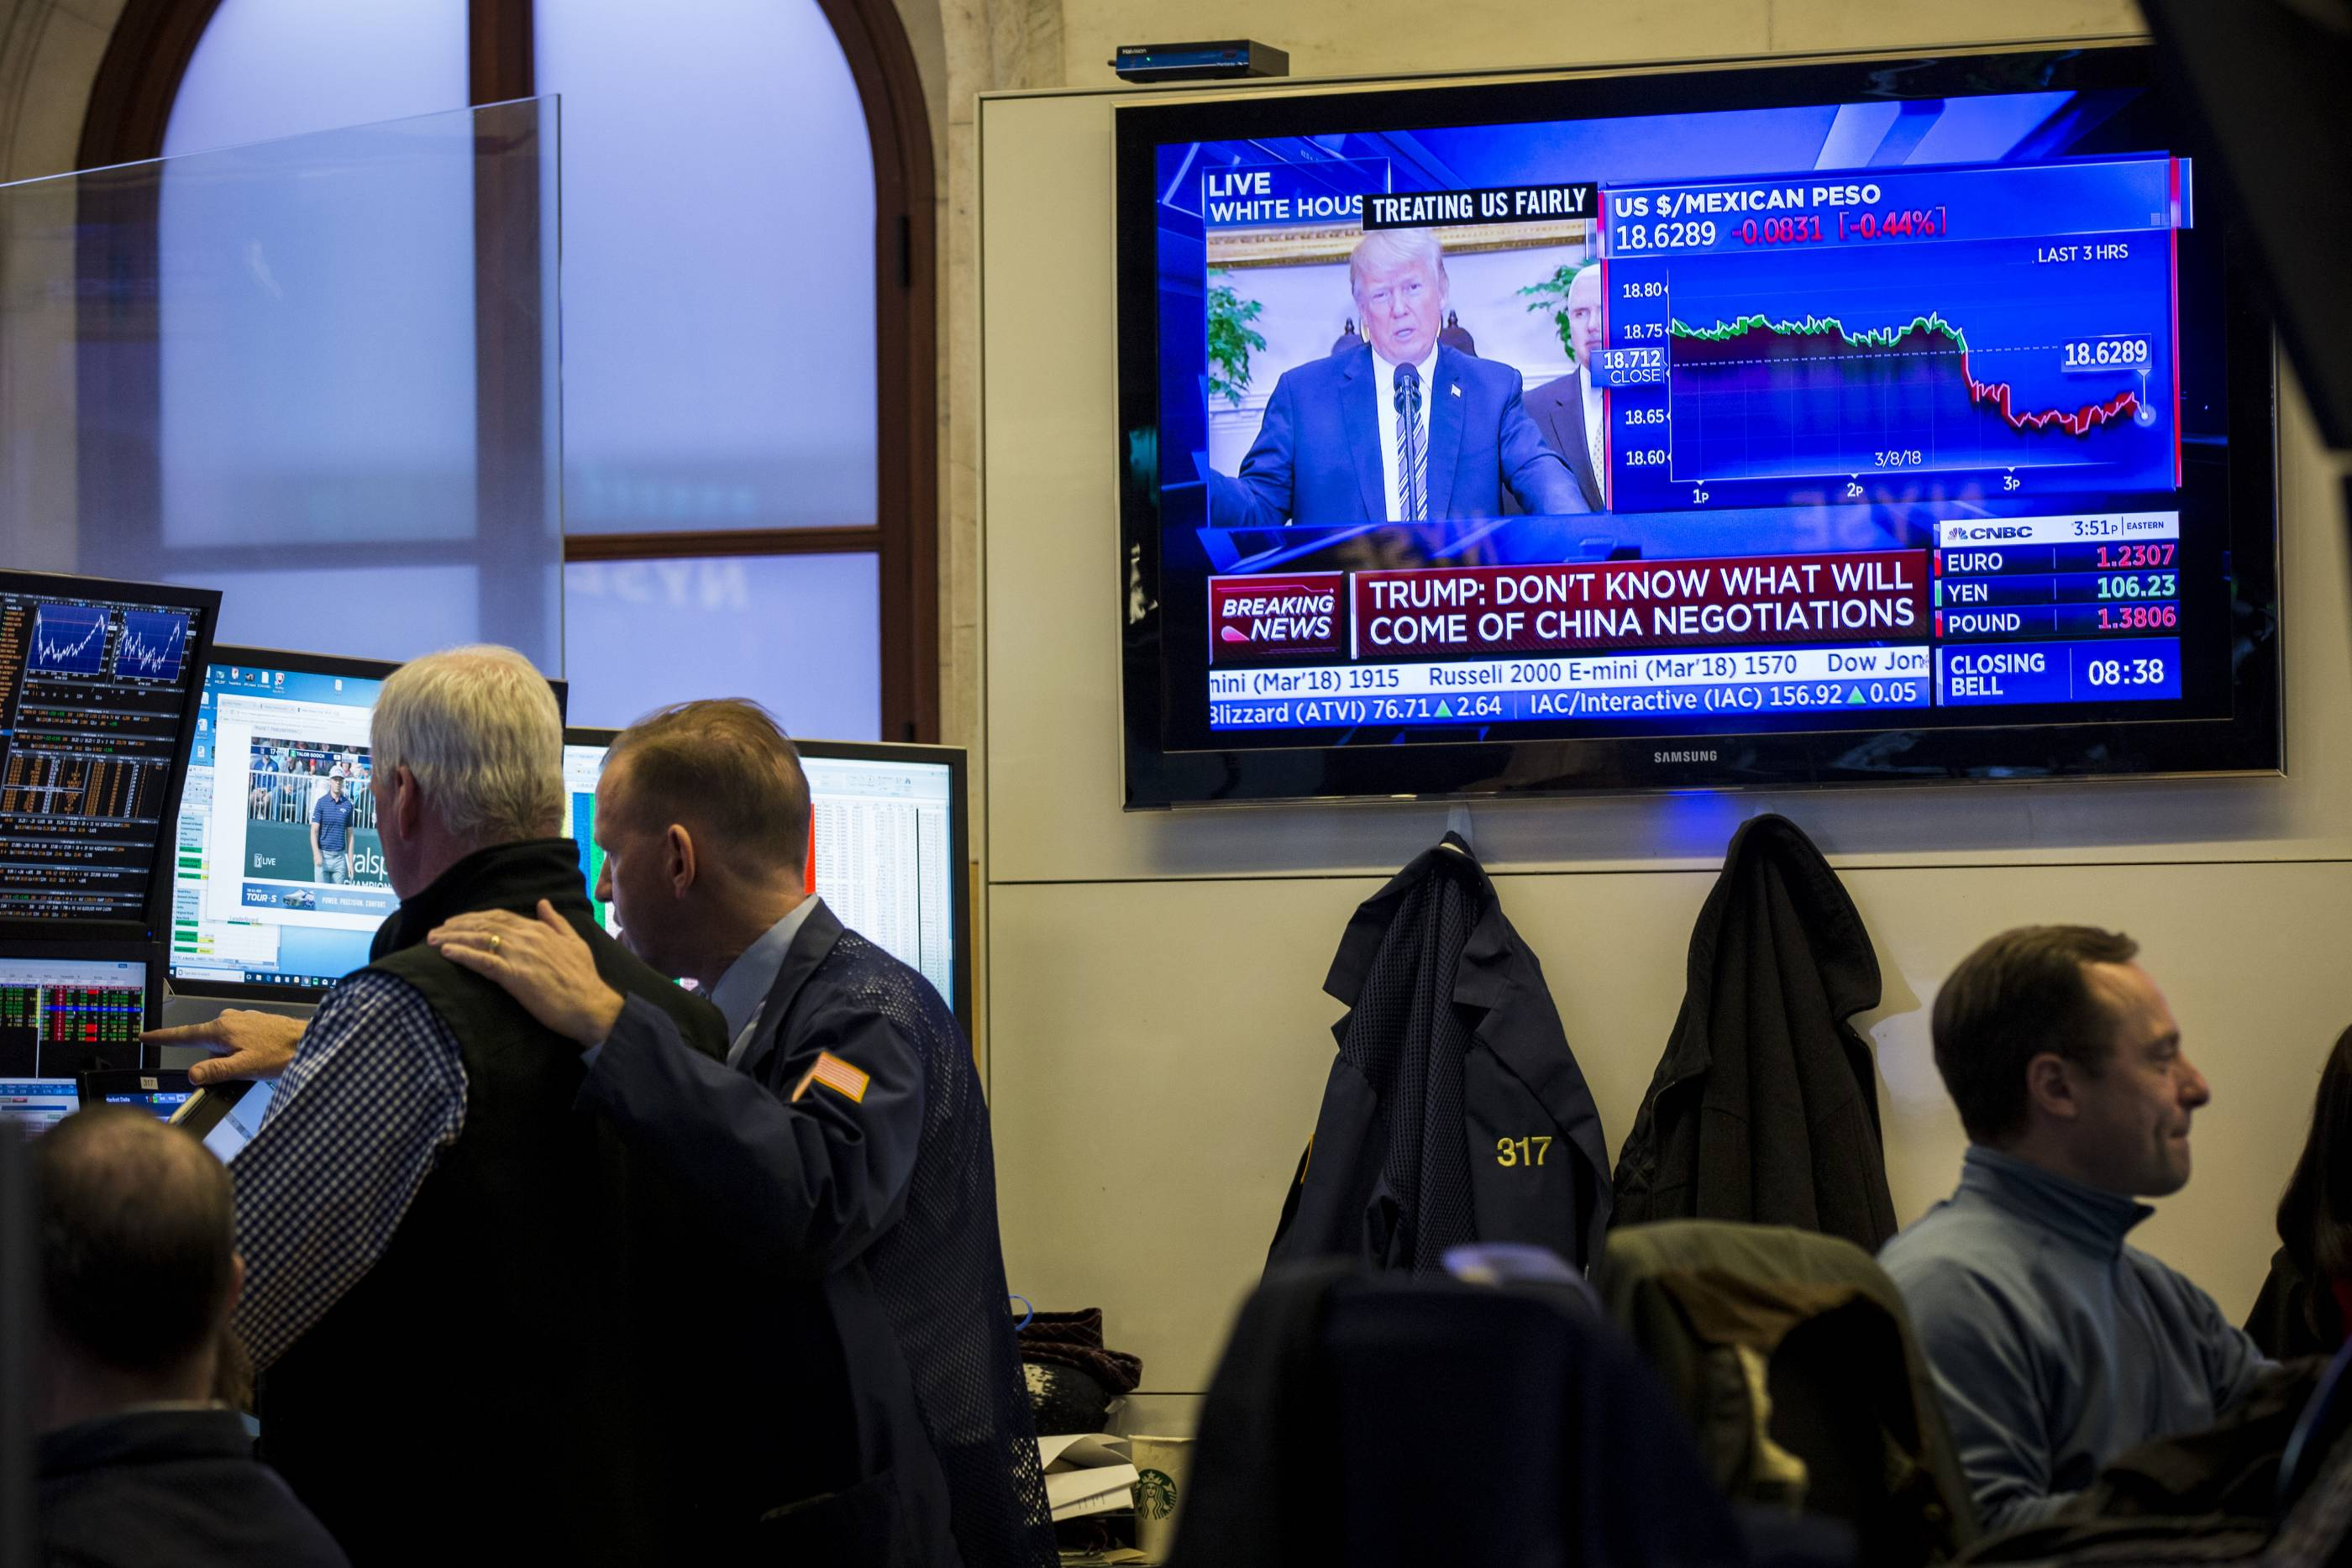 U.S. Markets React To Trump's Announcement On Steel And Aluminum Tariffs